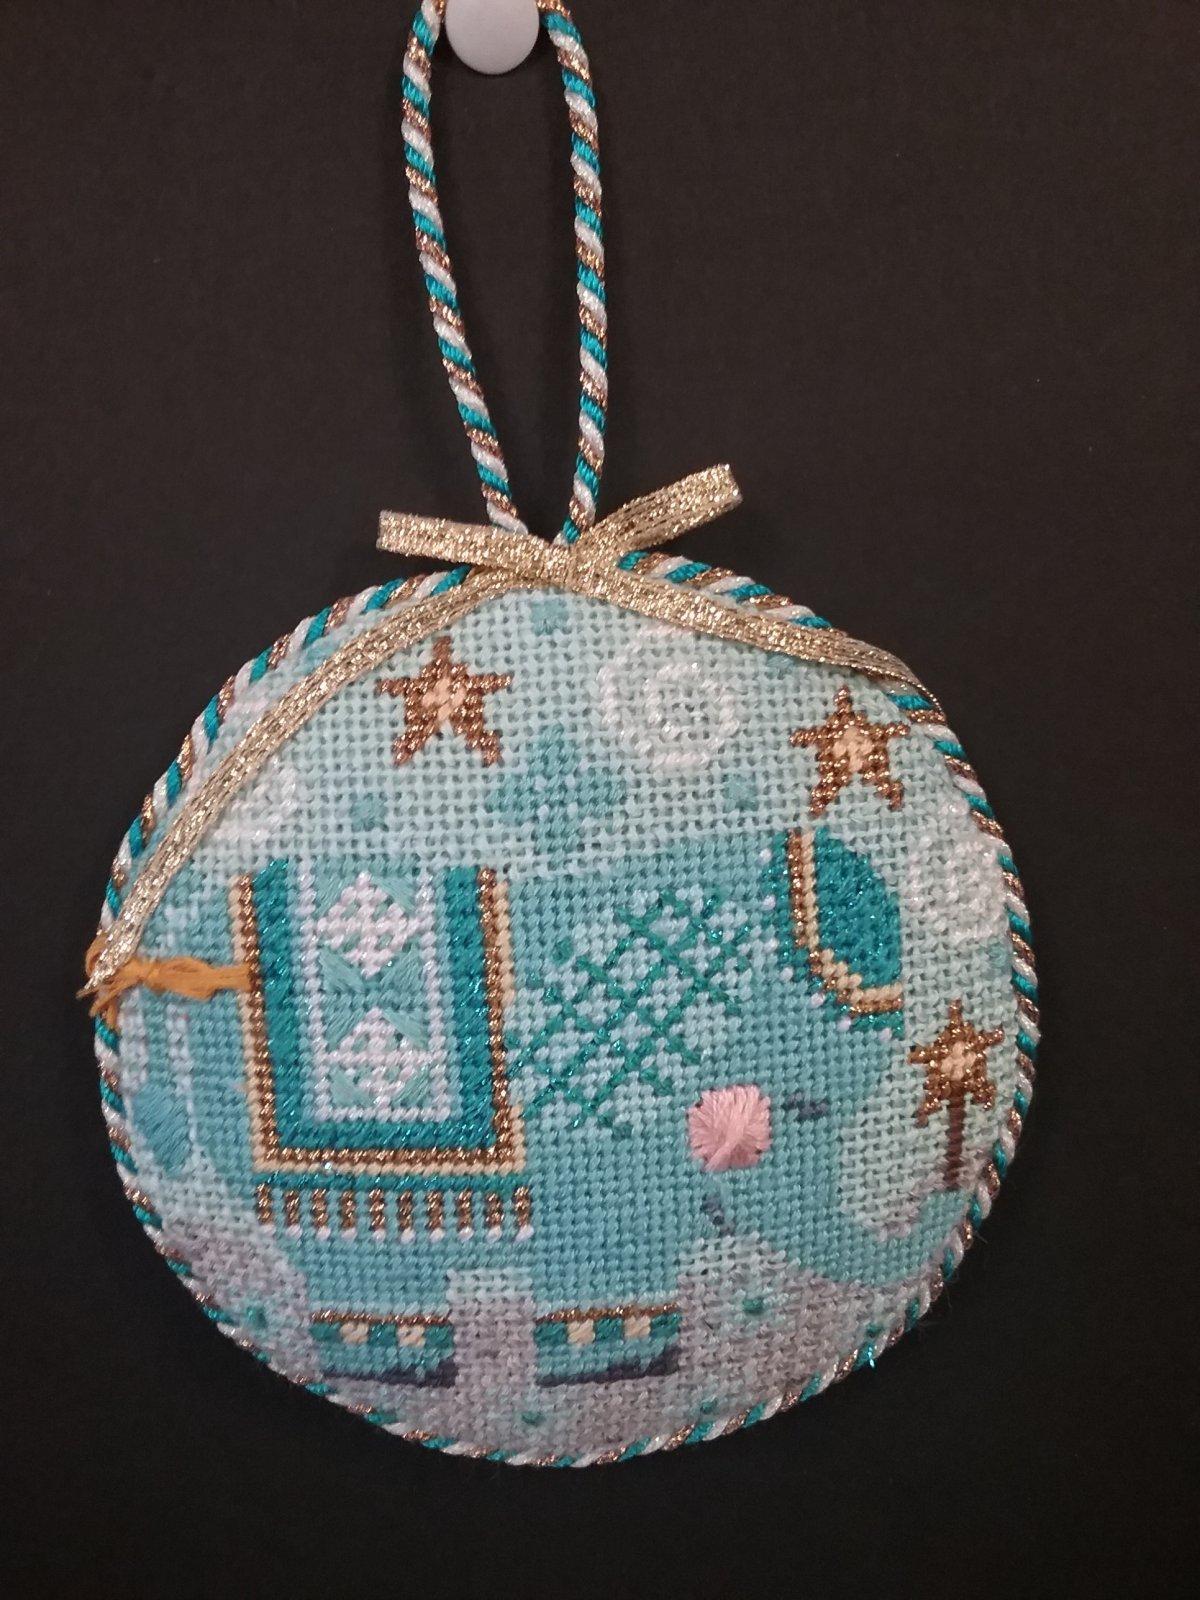 Danji Blue Elephant Ornament- Stitched by Cindy C.